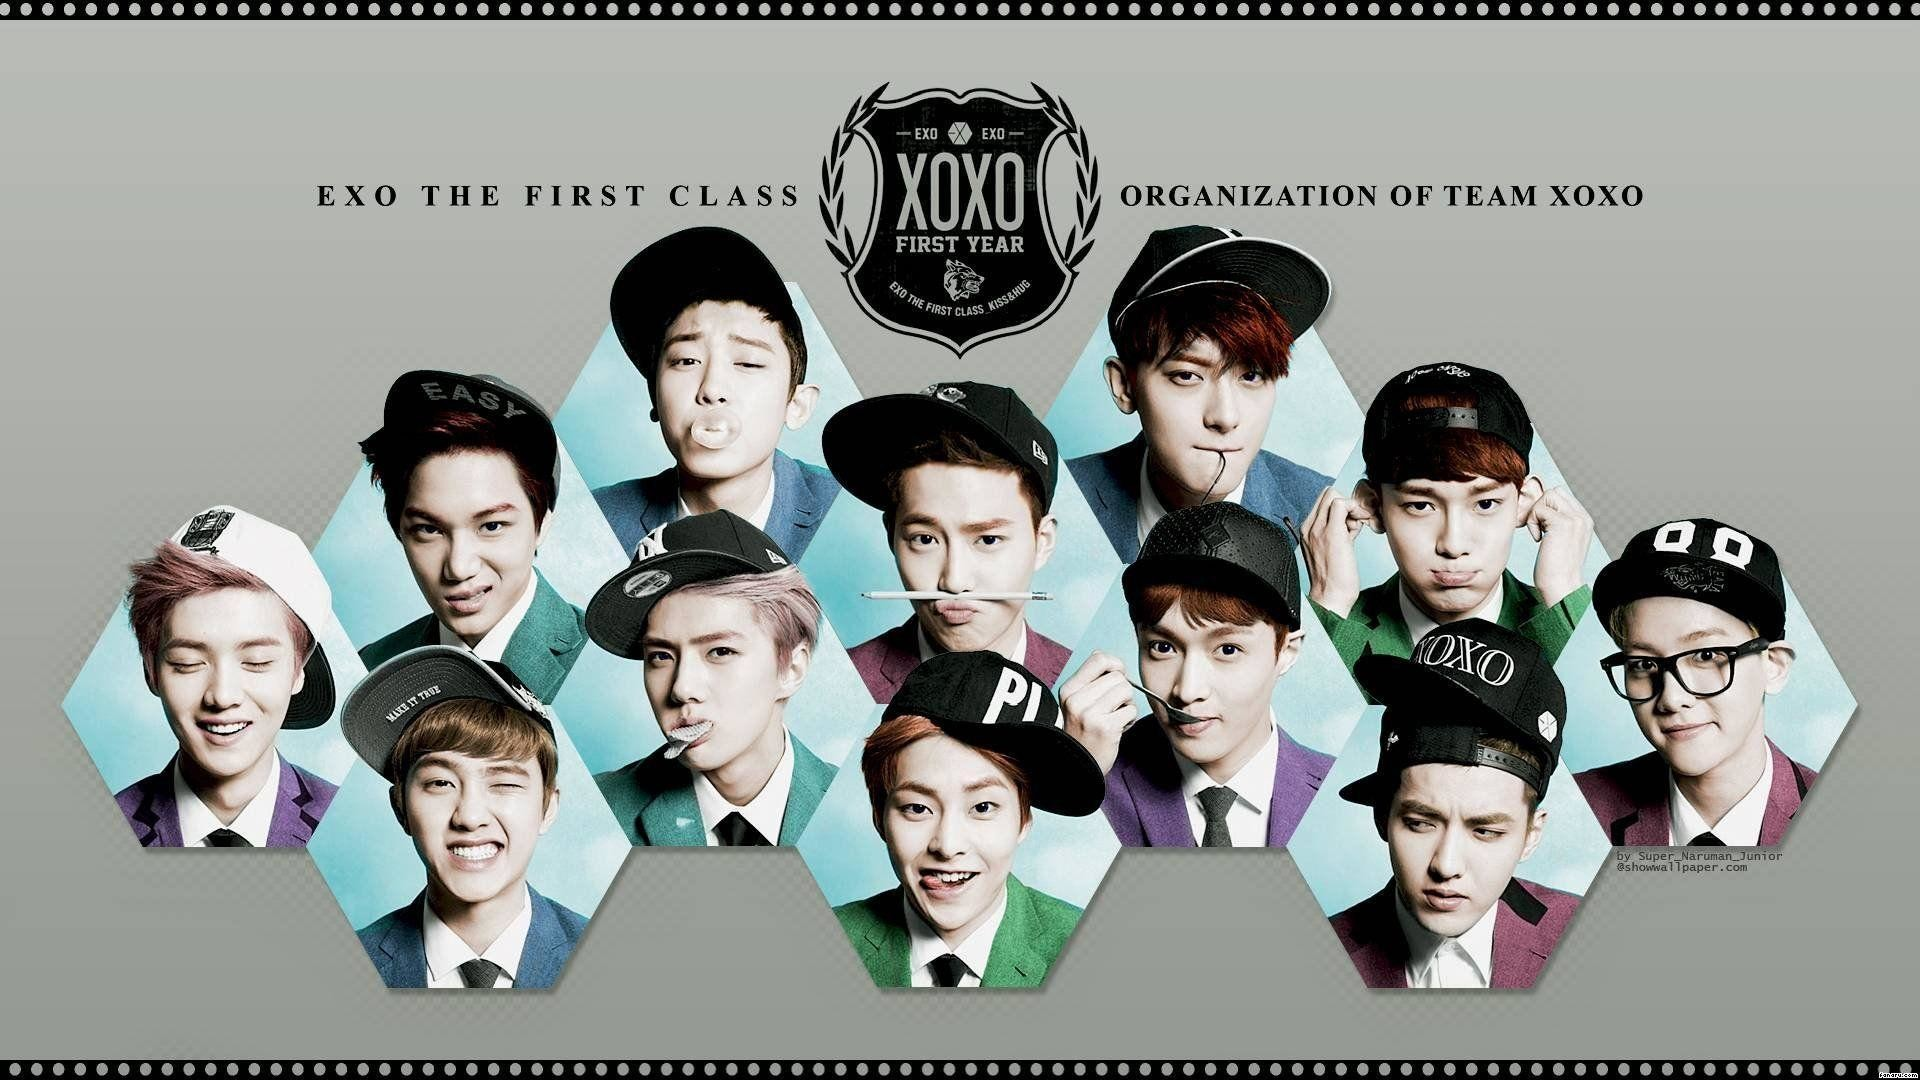 EXO HD Wallpaper, EXO HD Wallpapers for Desktop | V.429 | EXO HD